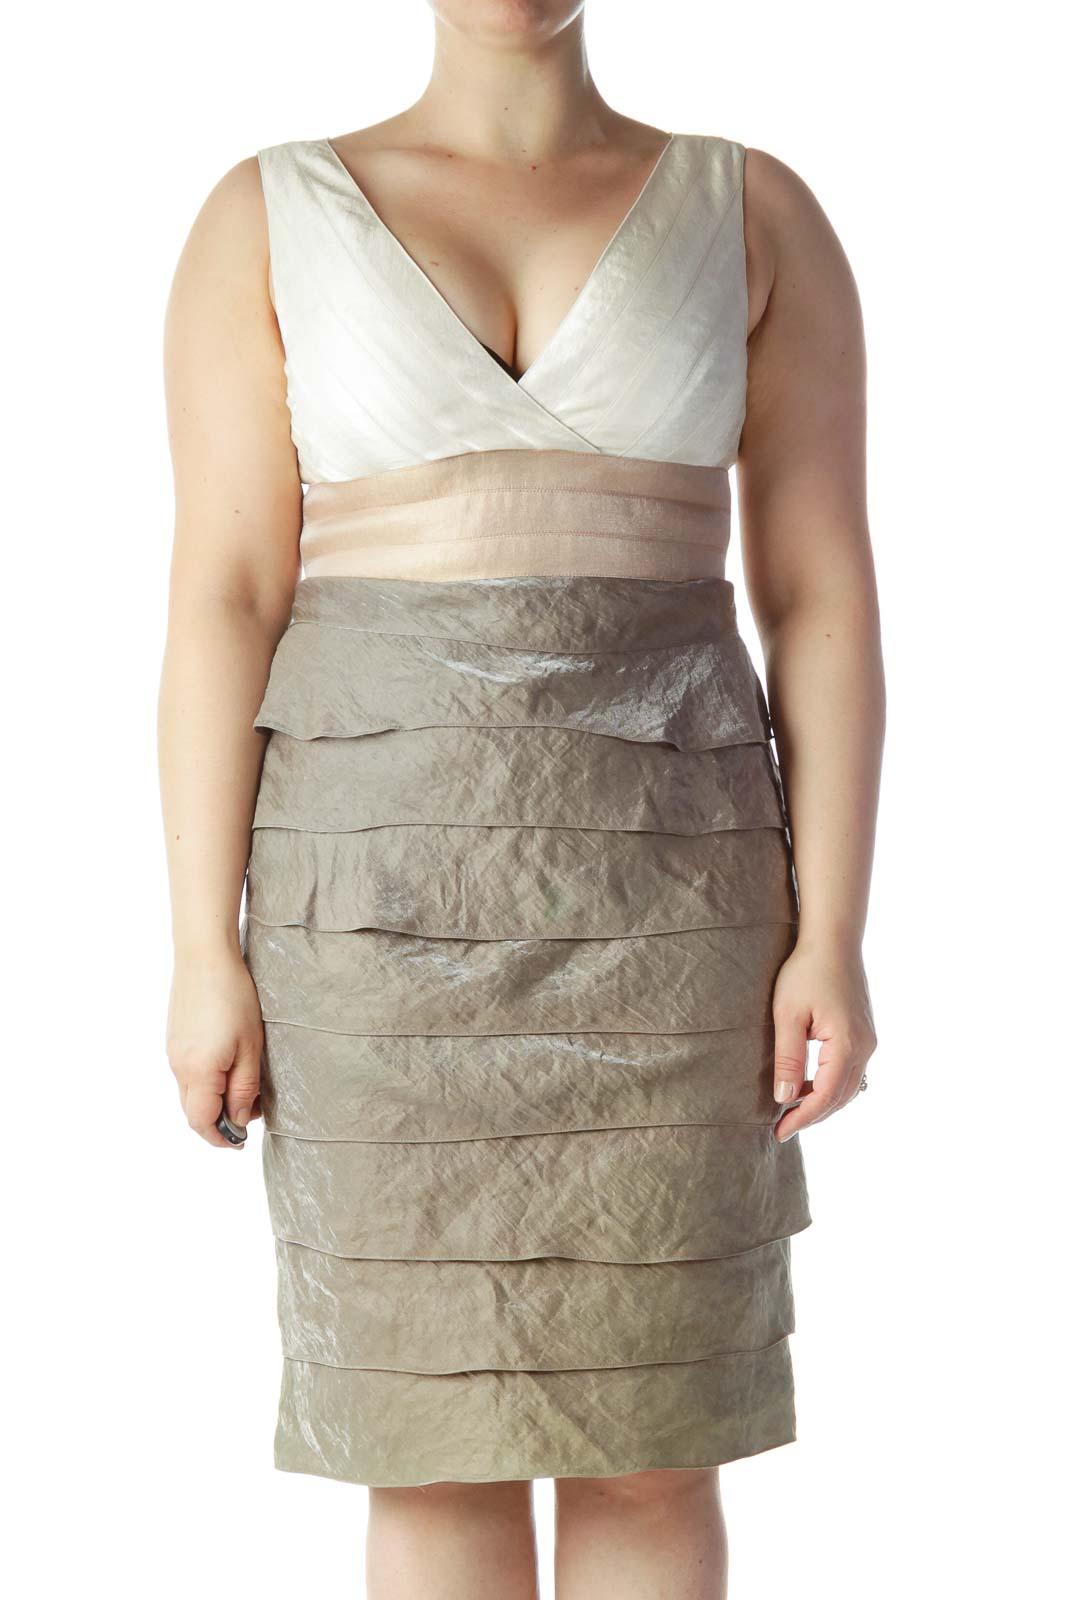 Beige Cream Gray Ruffled Cocktail Dress